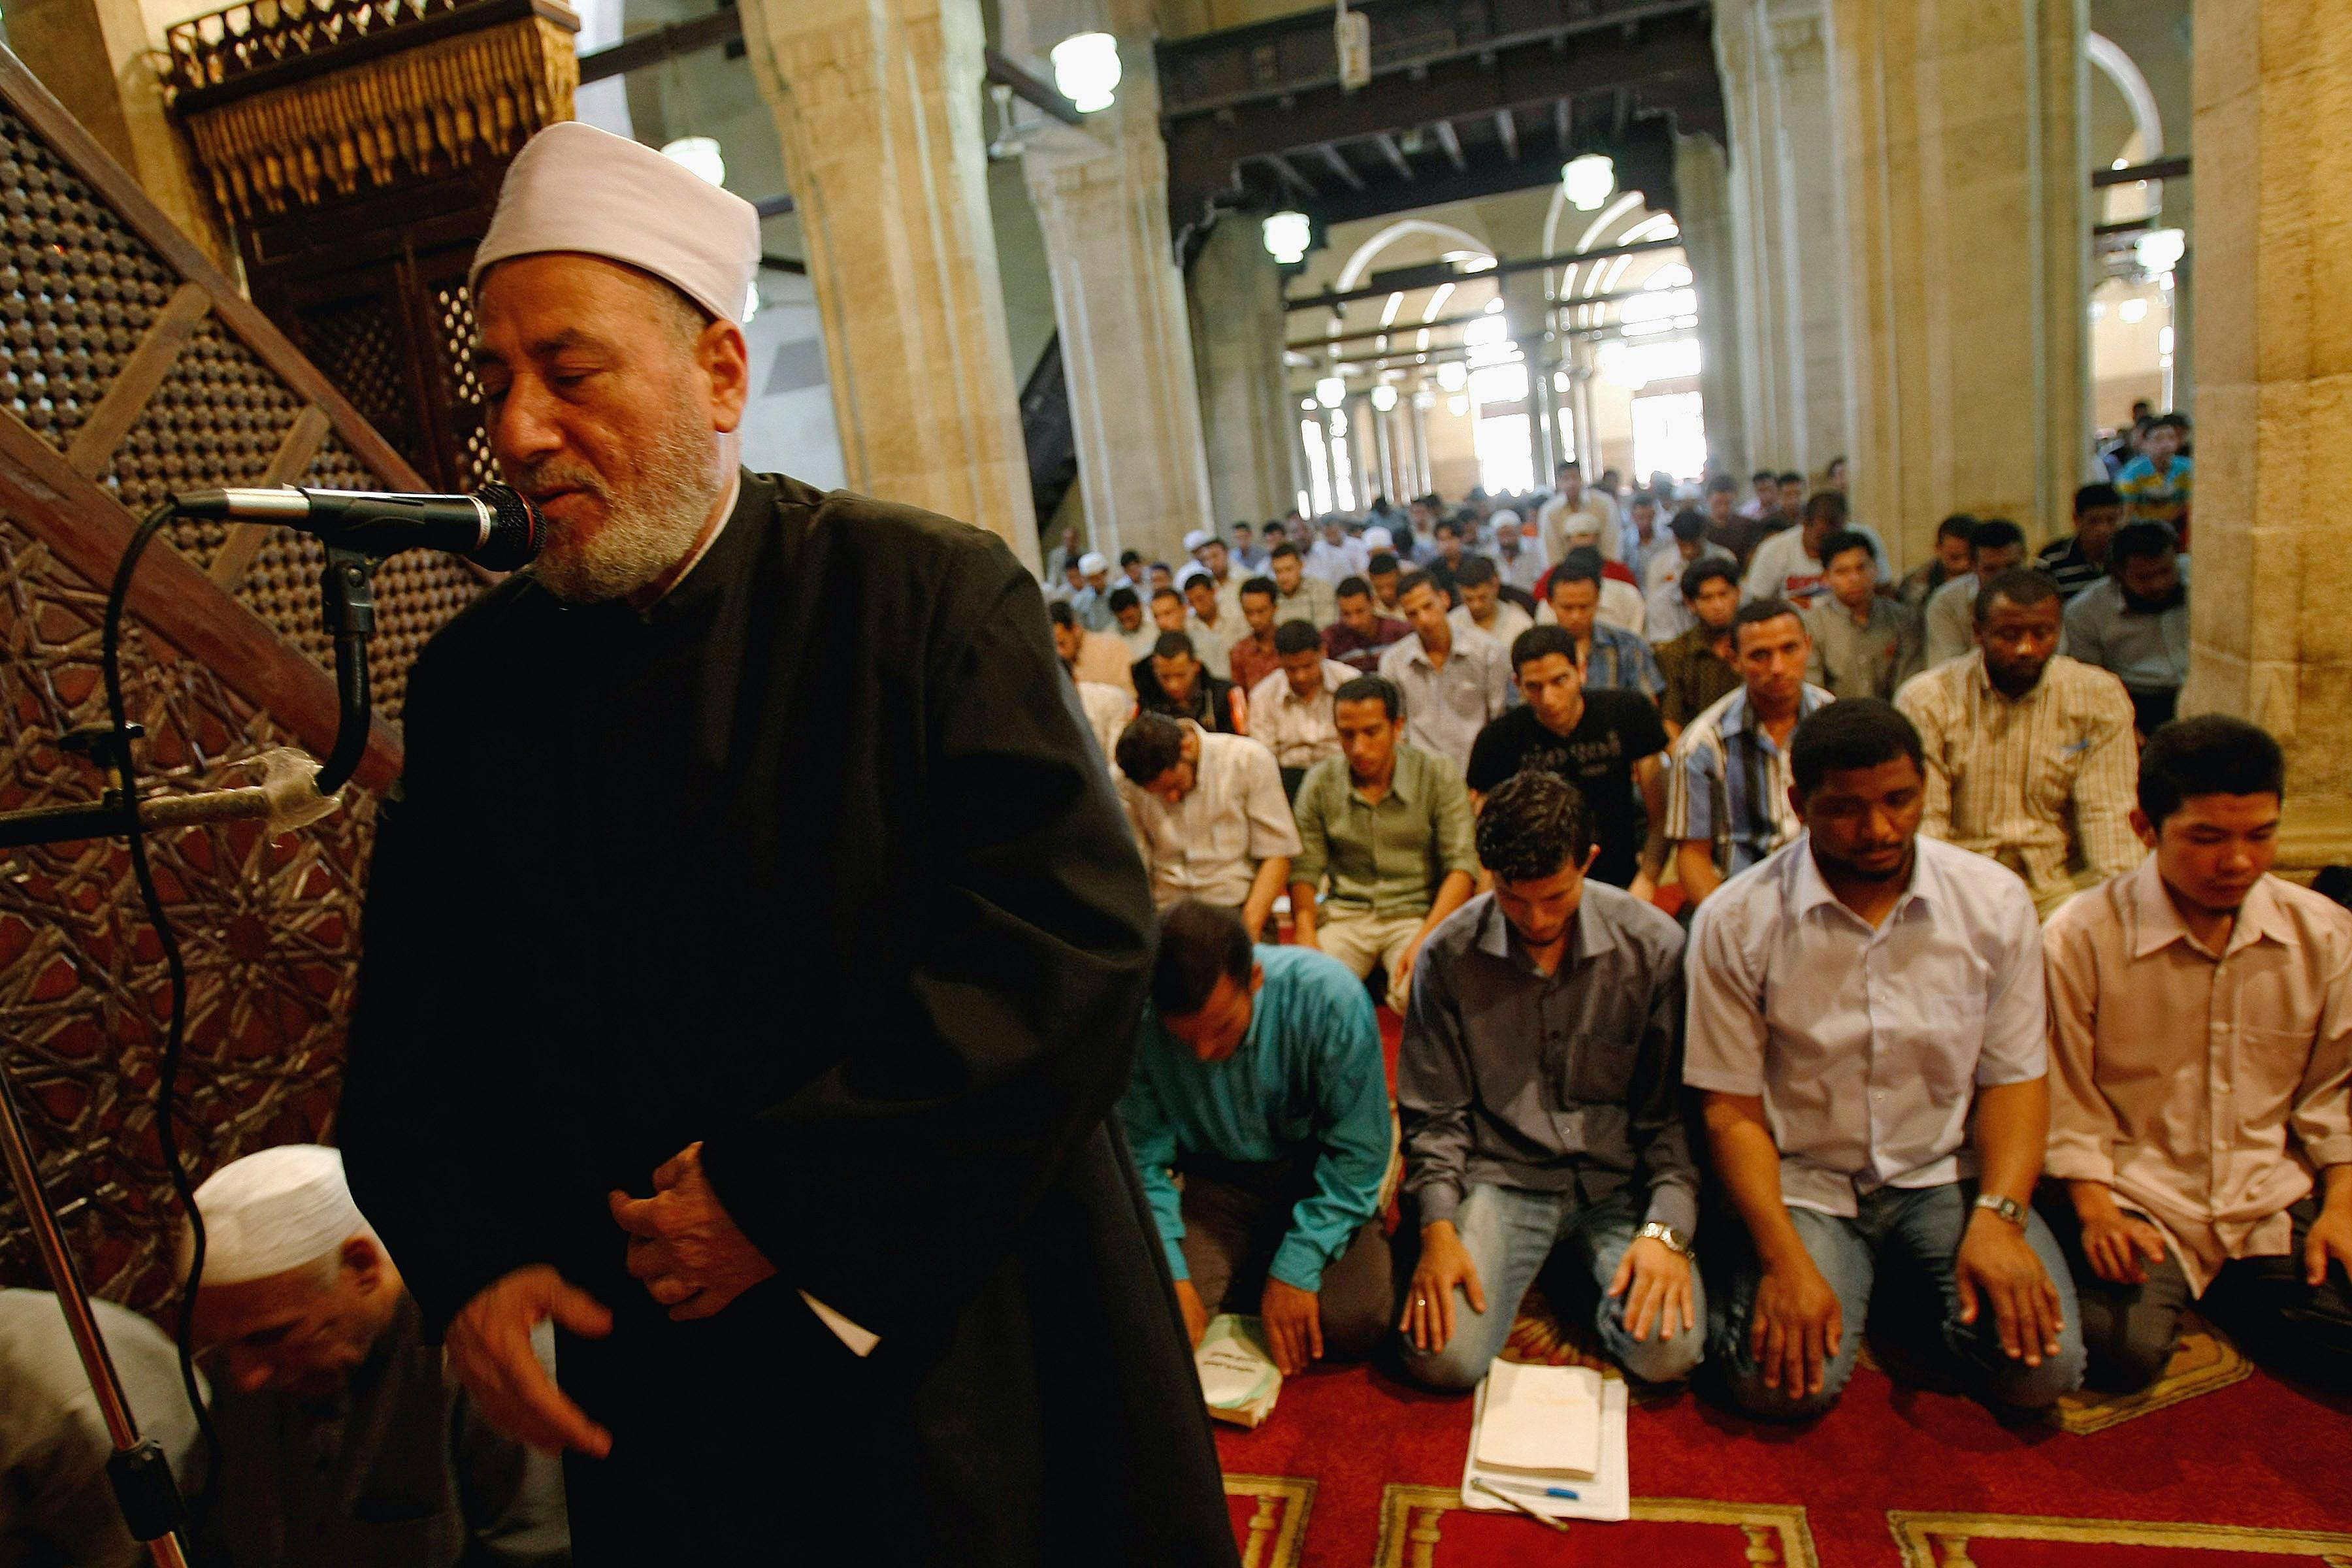 man leading prayer at mosque